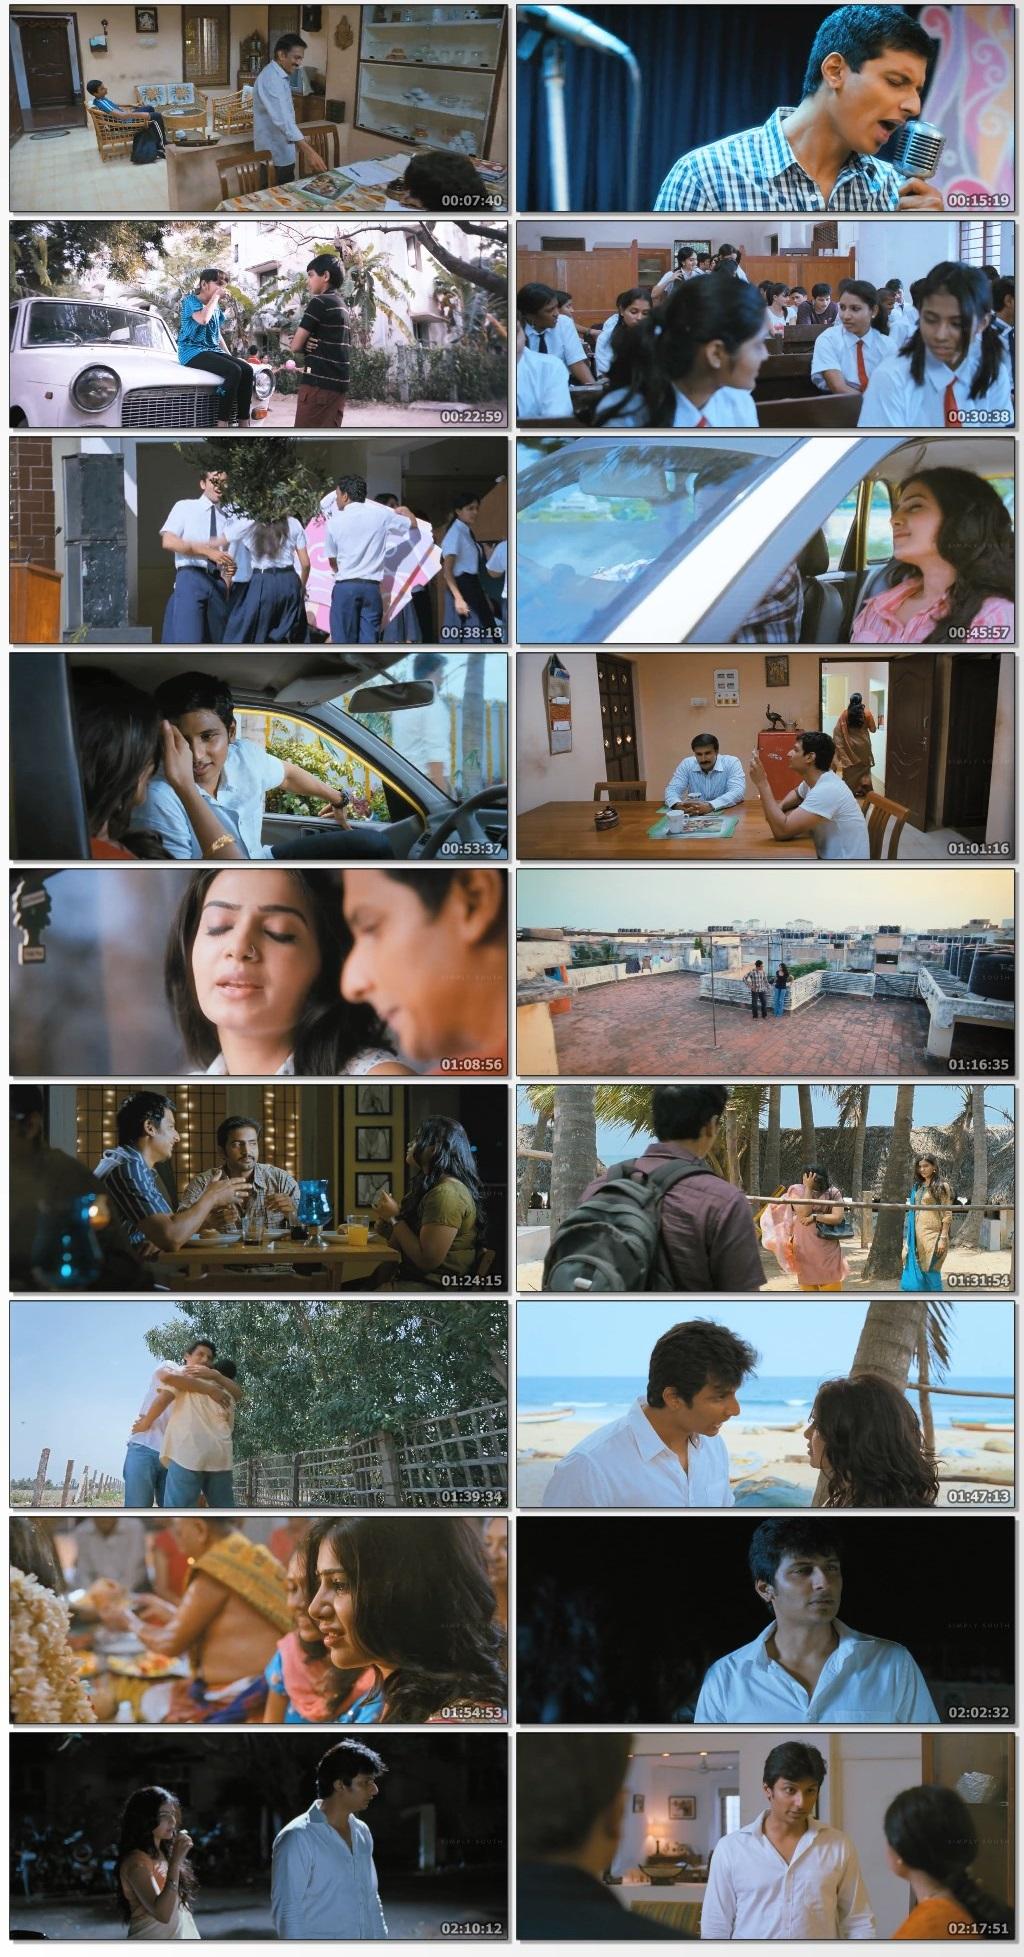 www-7-Star-HD-Team-inteha-Pyaar-Ki-Neethaane-En-Ponvasantham-2021-New-South-Full-Movie-Dual-Audio-Hi